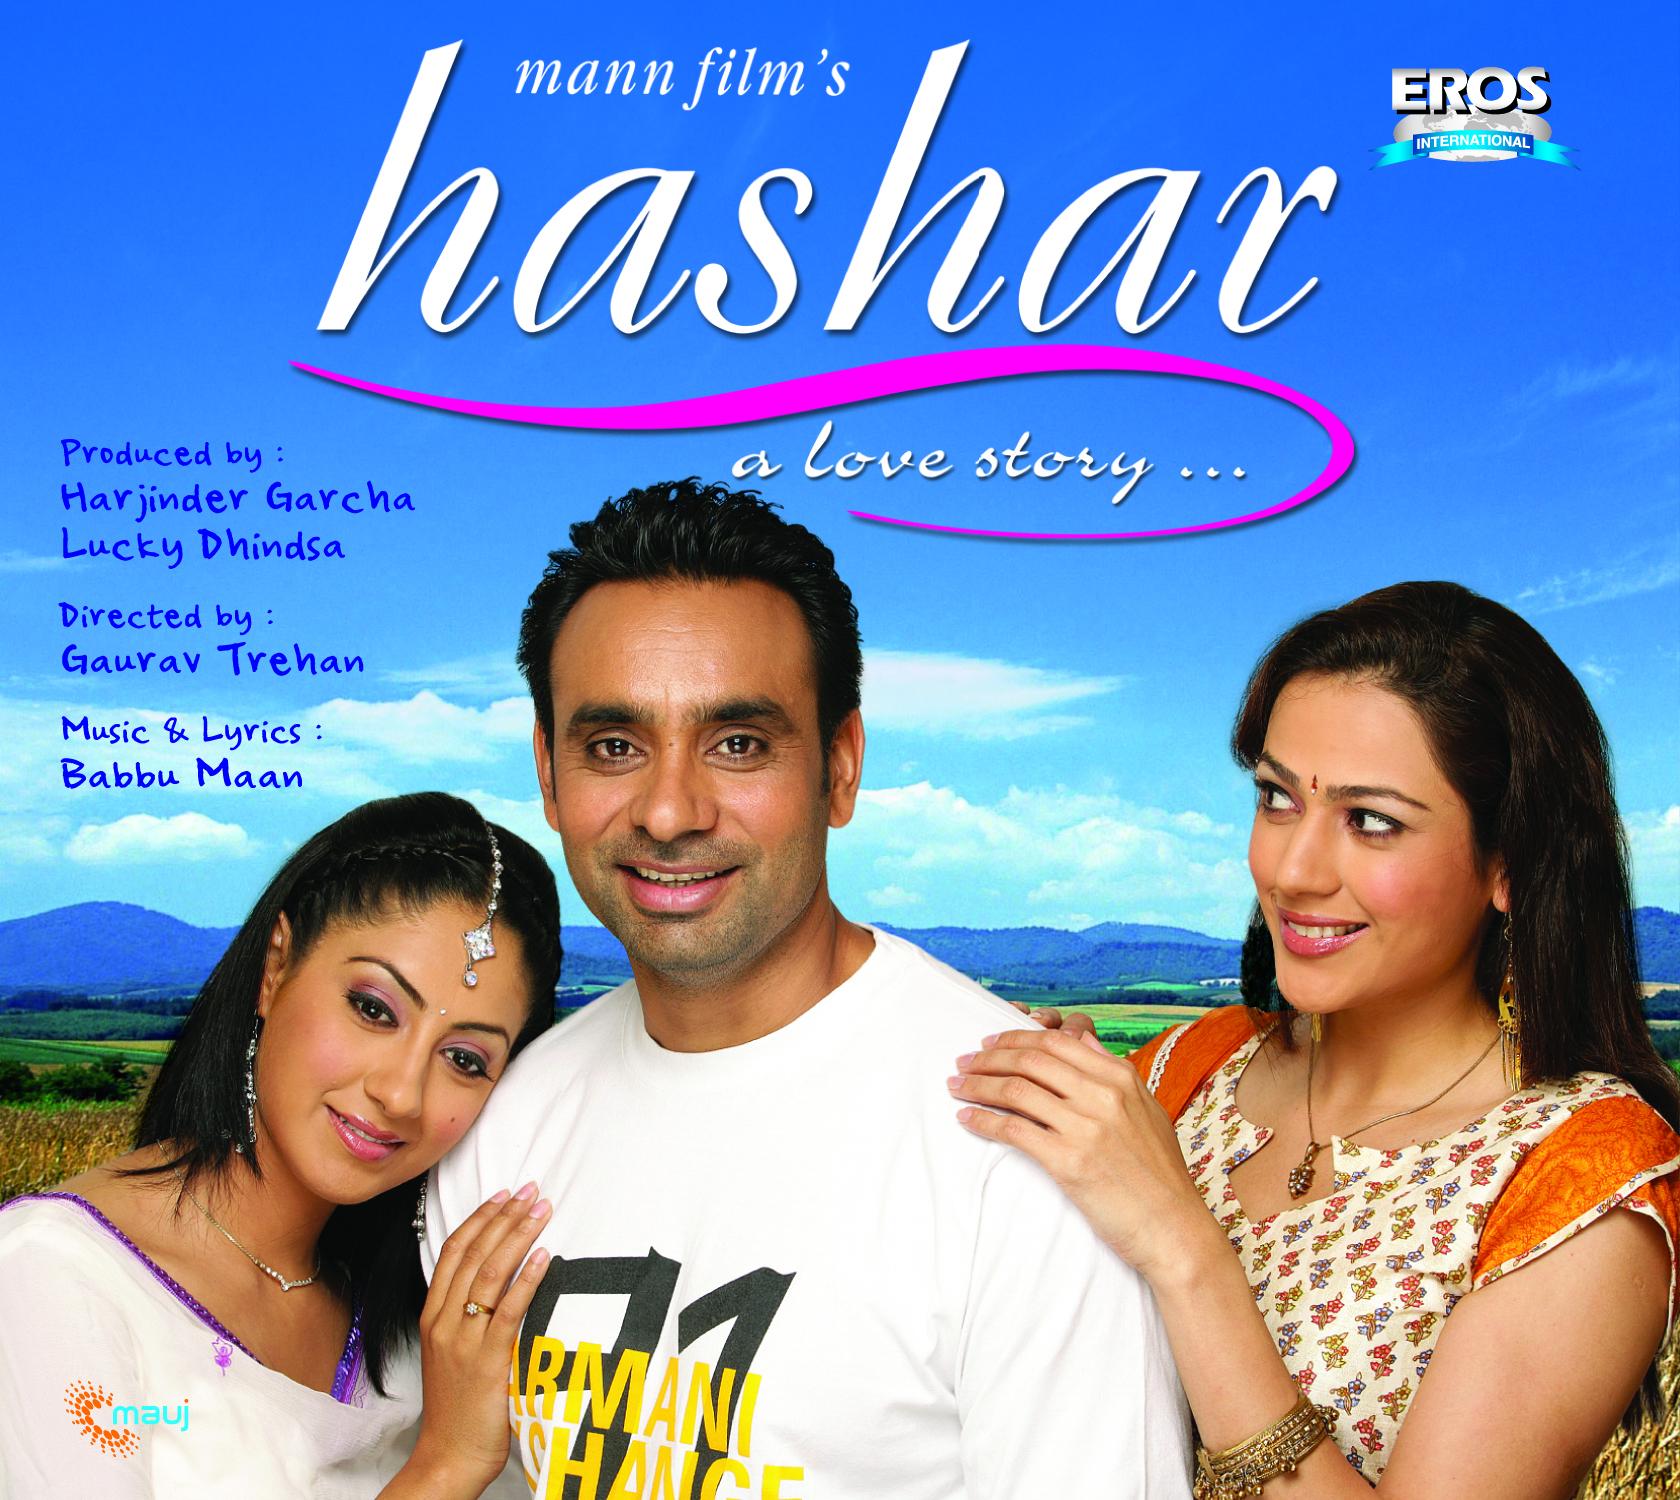 Hashar - A Love Story